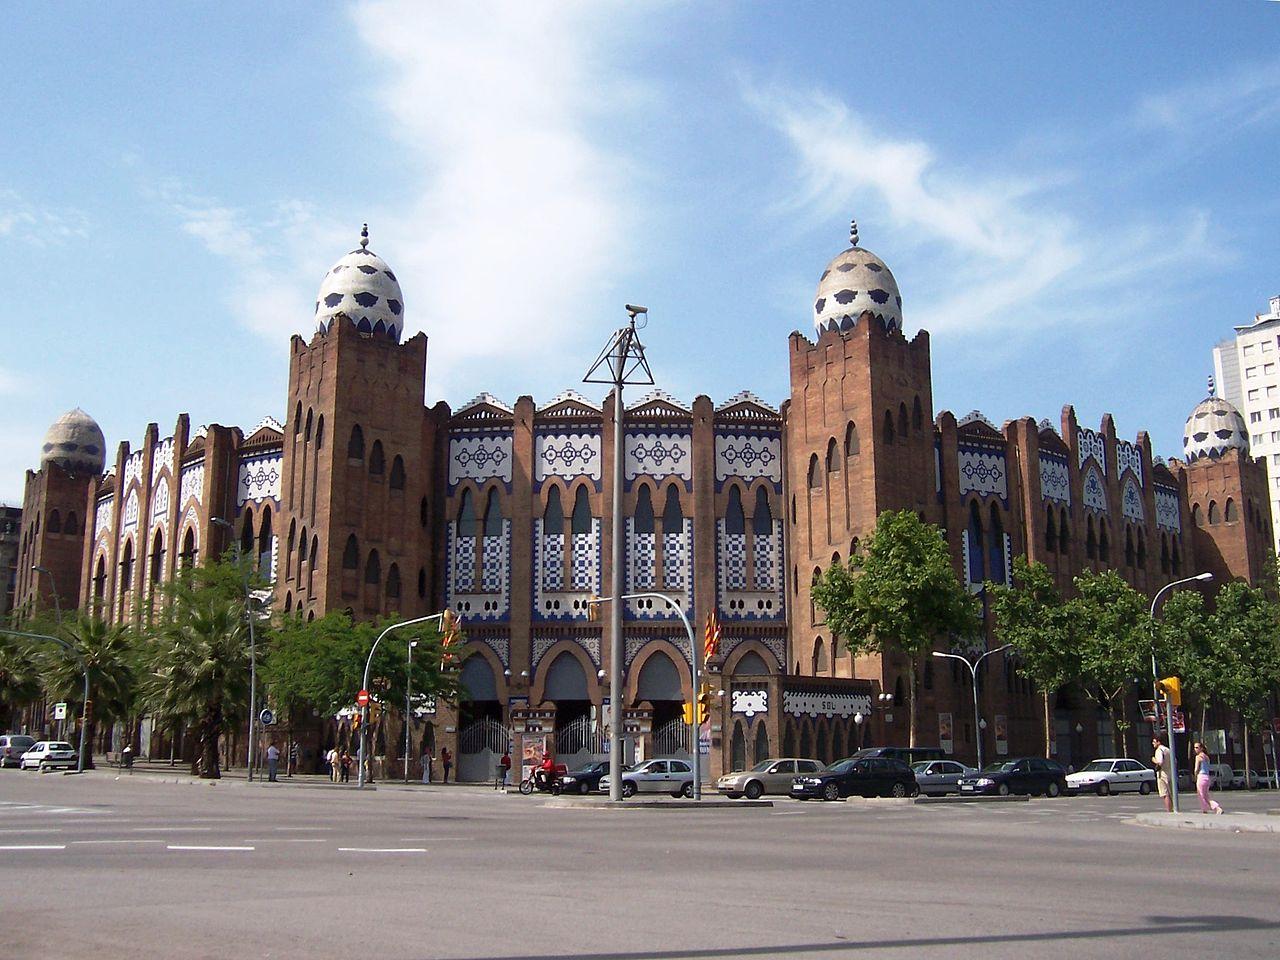 1280px-050529_Barcelona_027.jpg